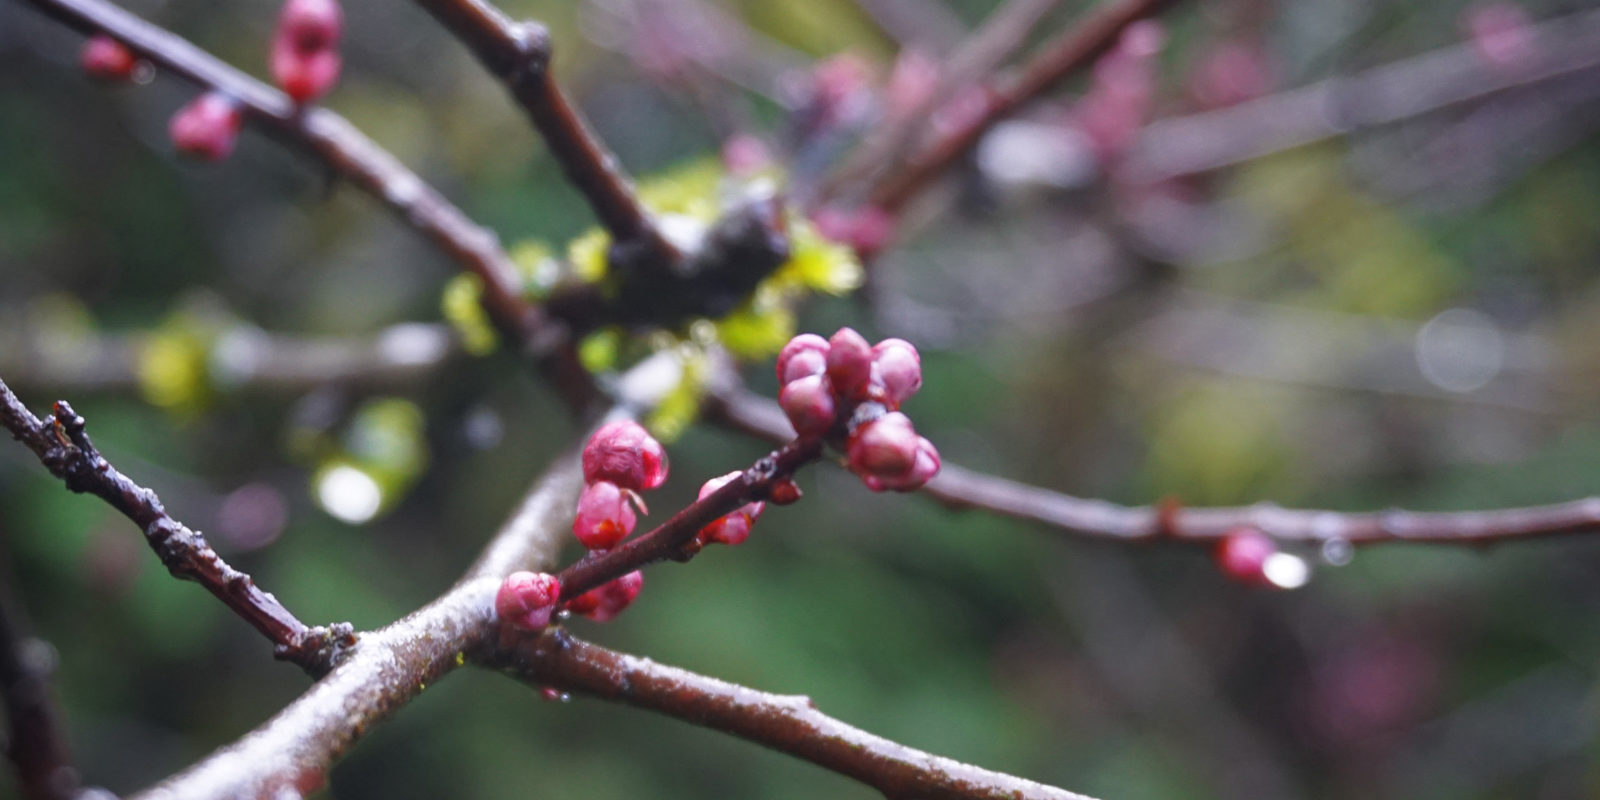 Feb 2016 Garden Photos Plants -12-02-2016 - Cherry Blossom Buds